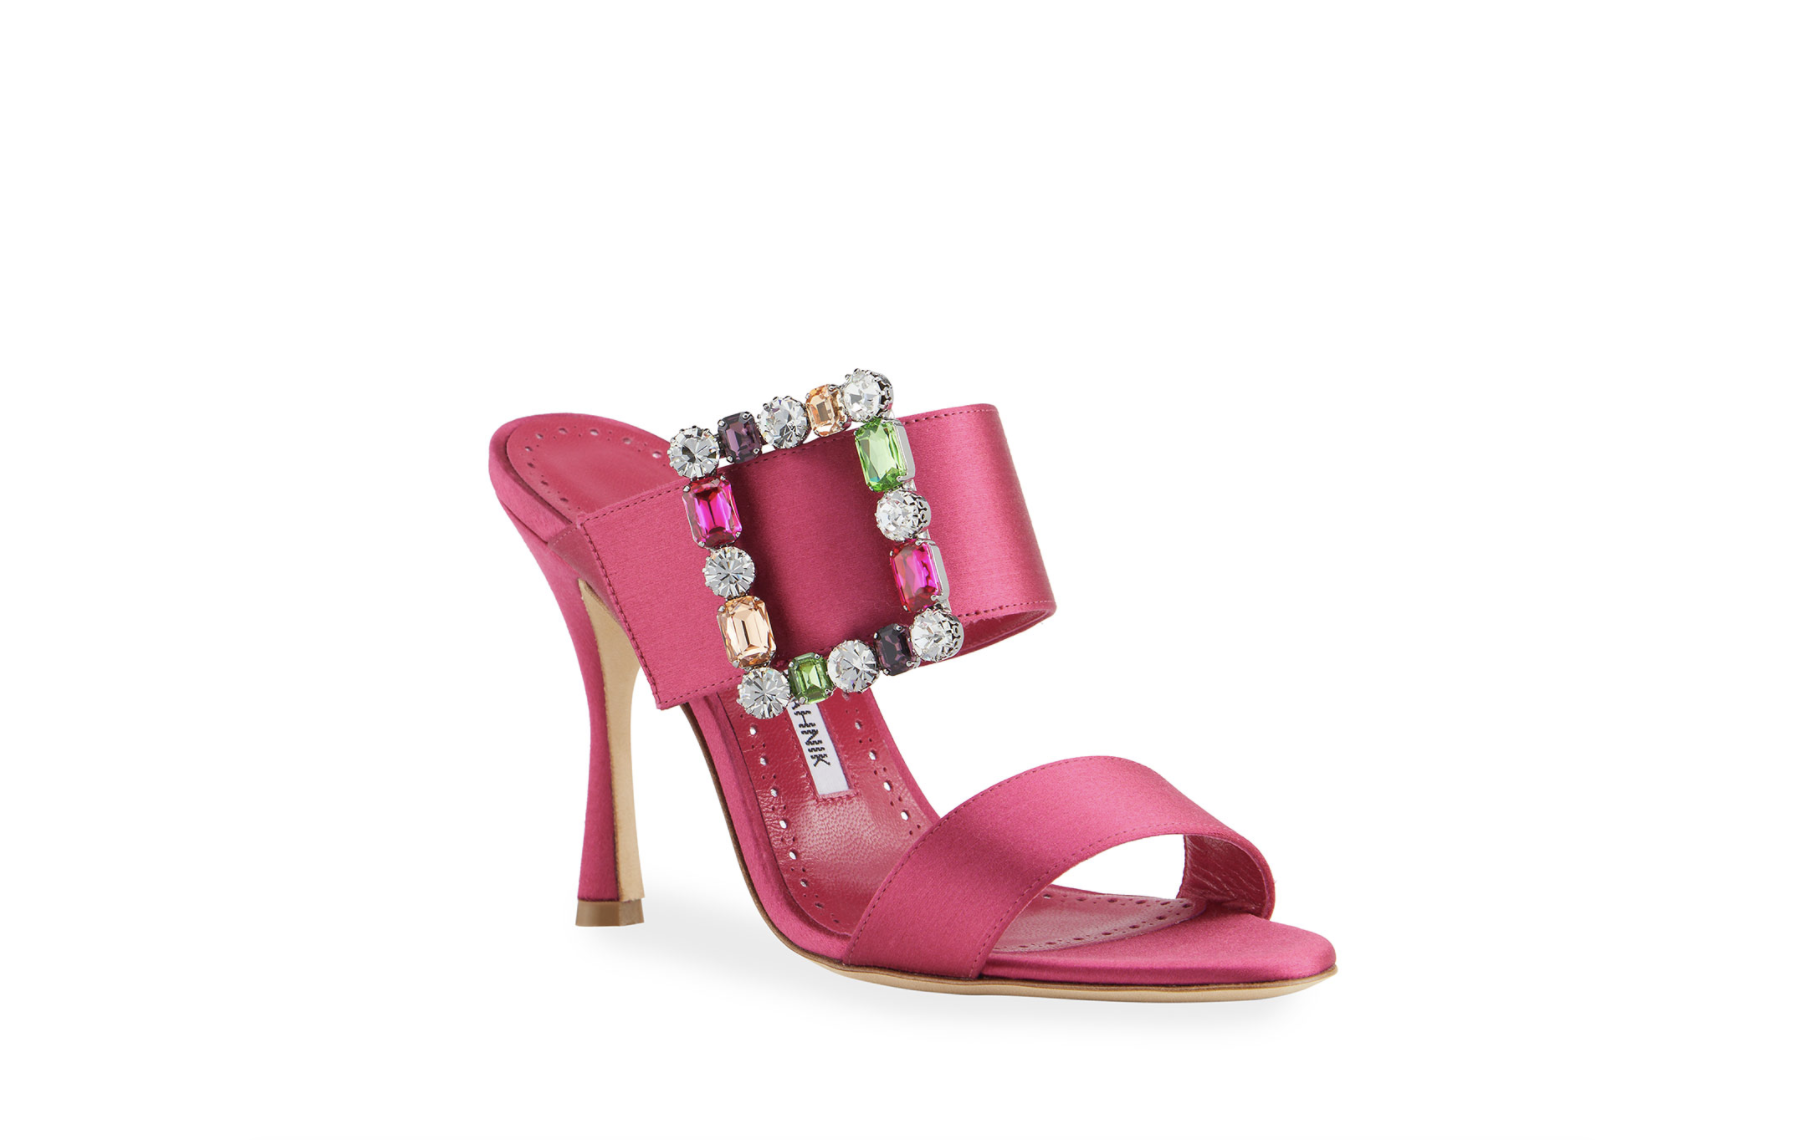 Neiman Marcus x Manolo Blahnik Verda Embellished-Buckle Mule Sandals